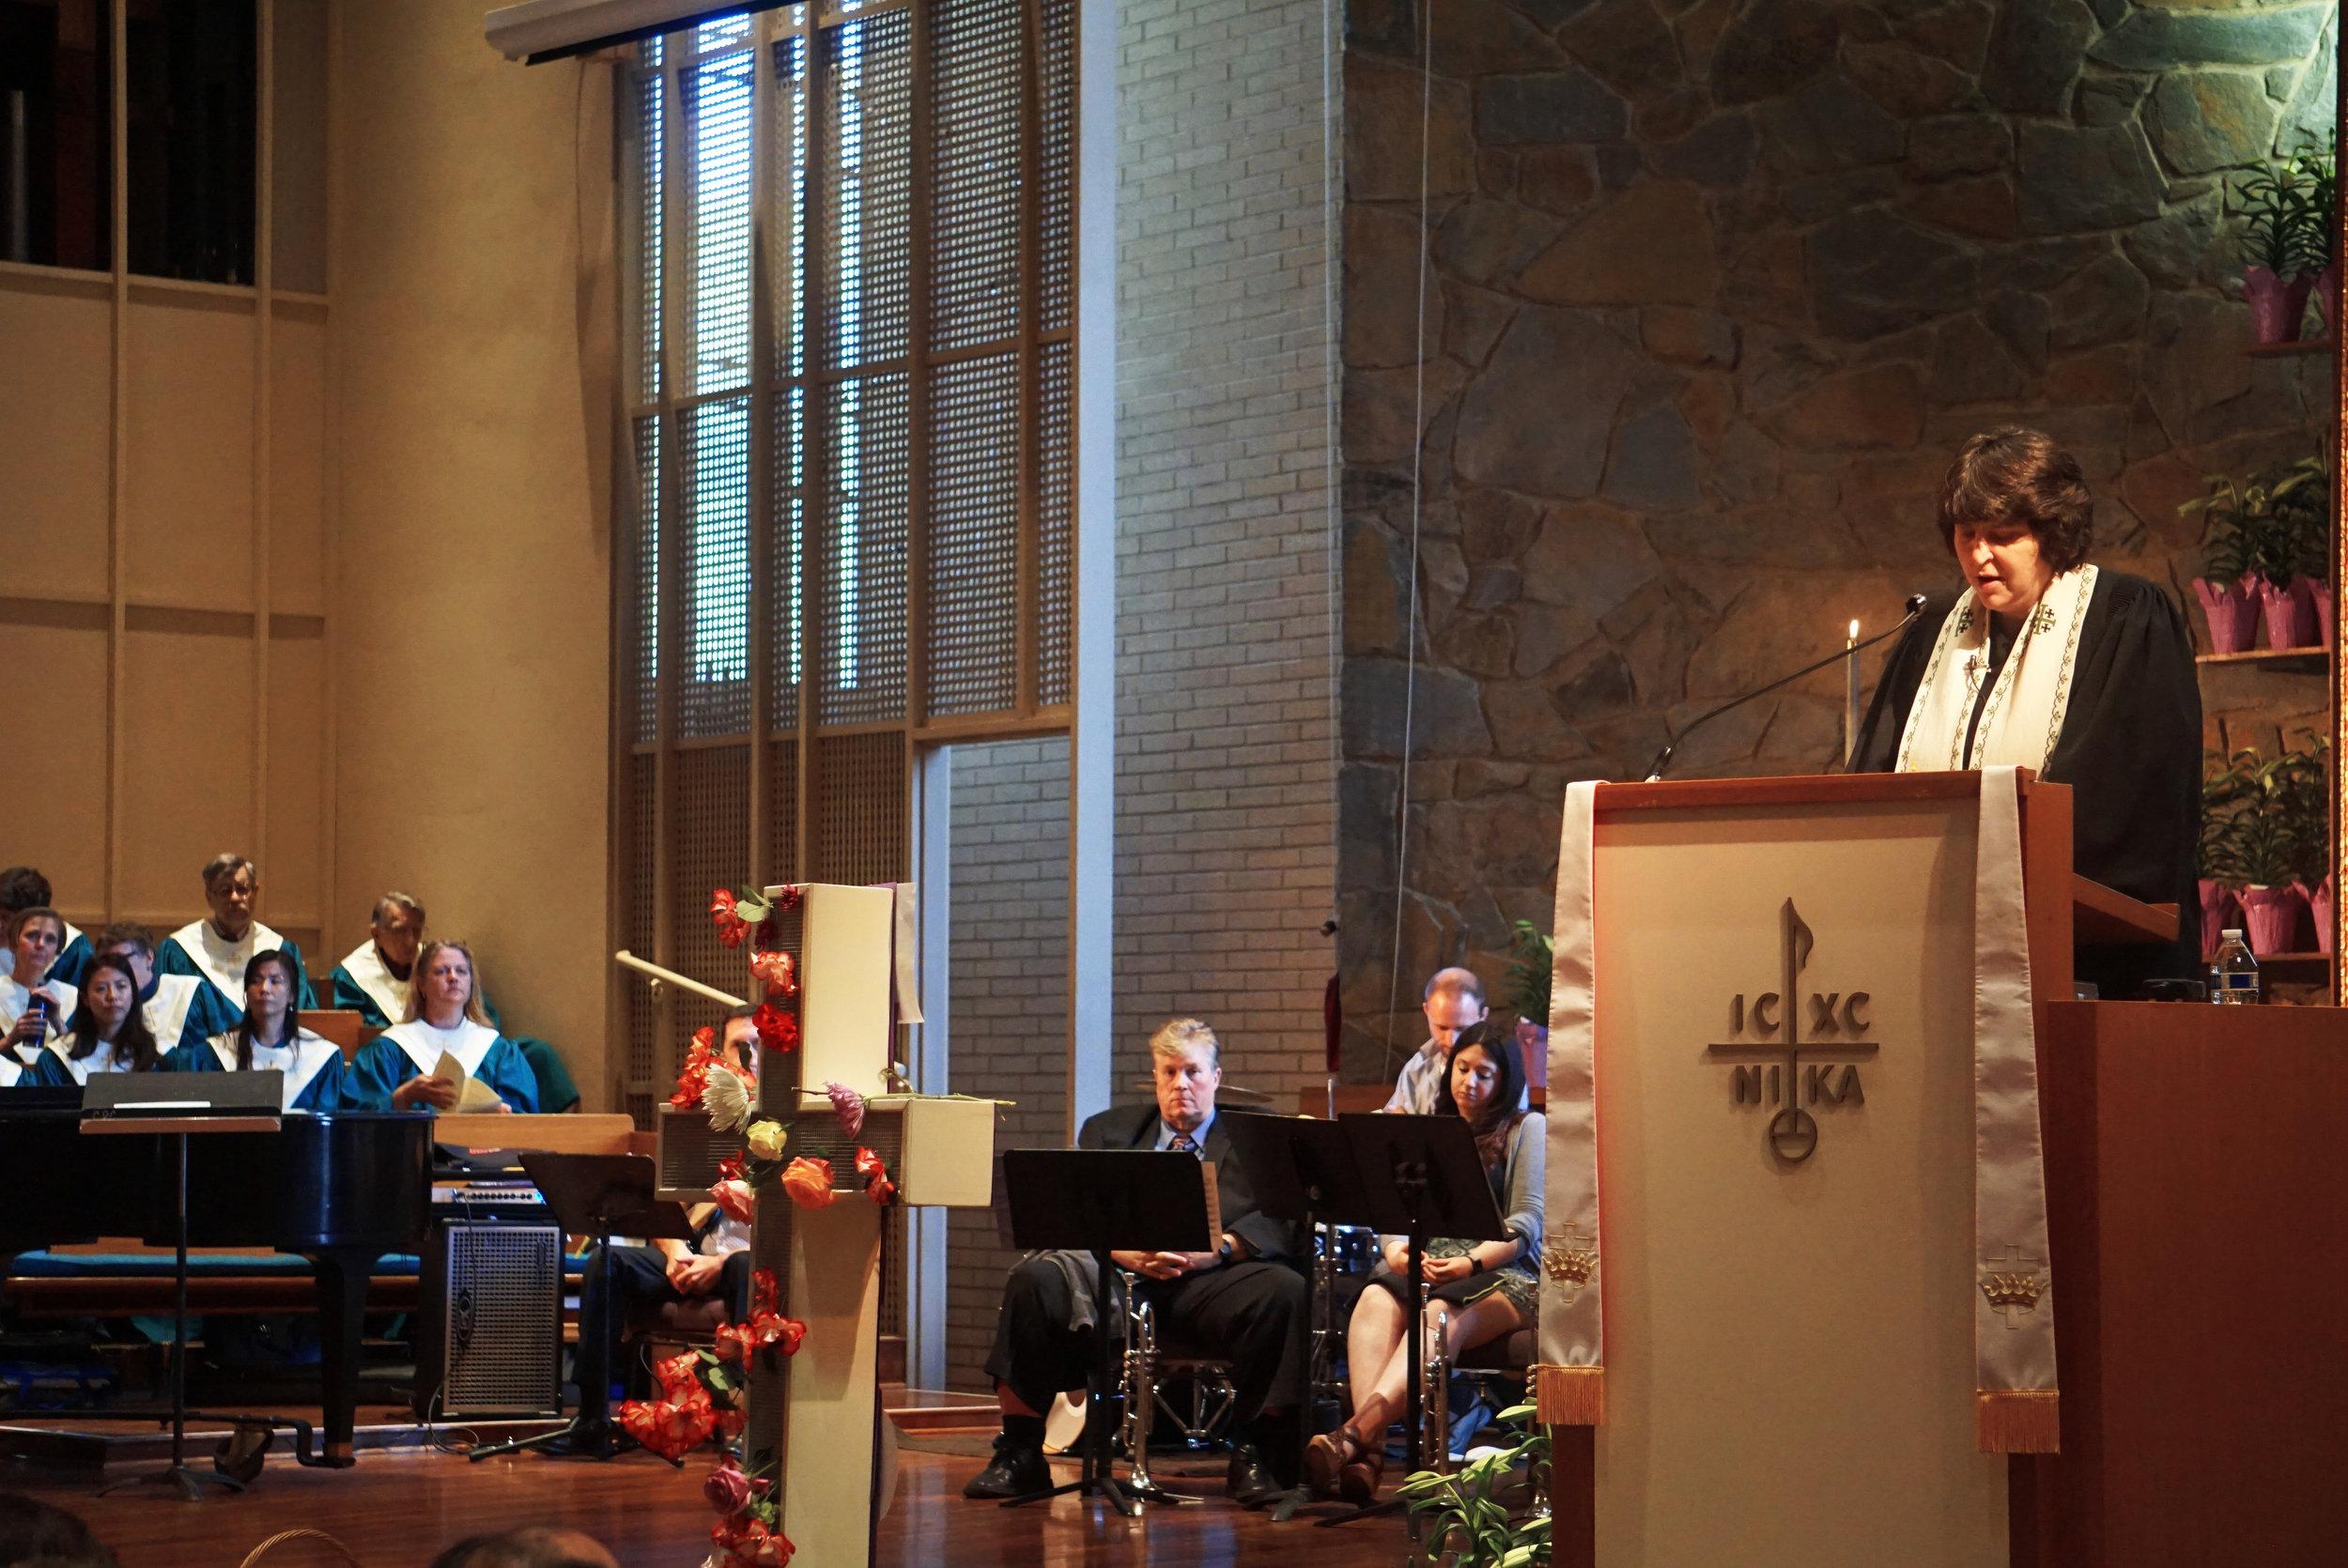 claremont-presbyterian-church-easter-karen-sapio-2.jpg